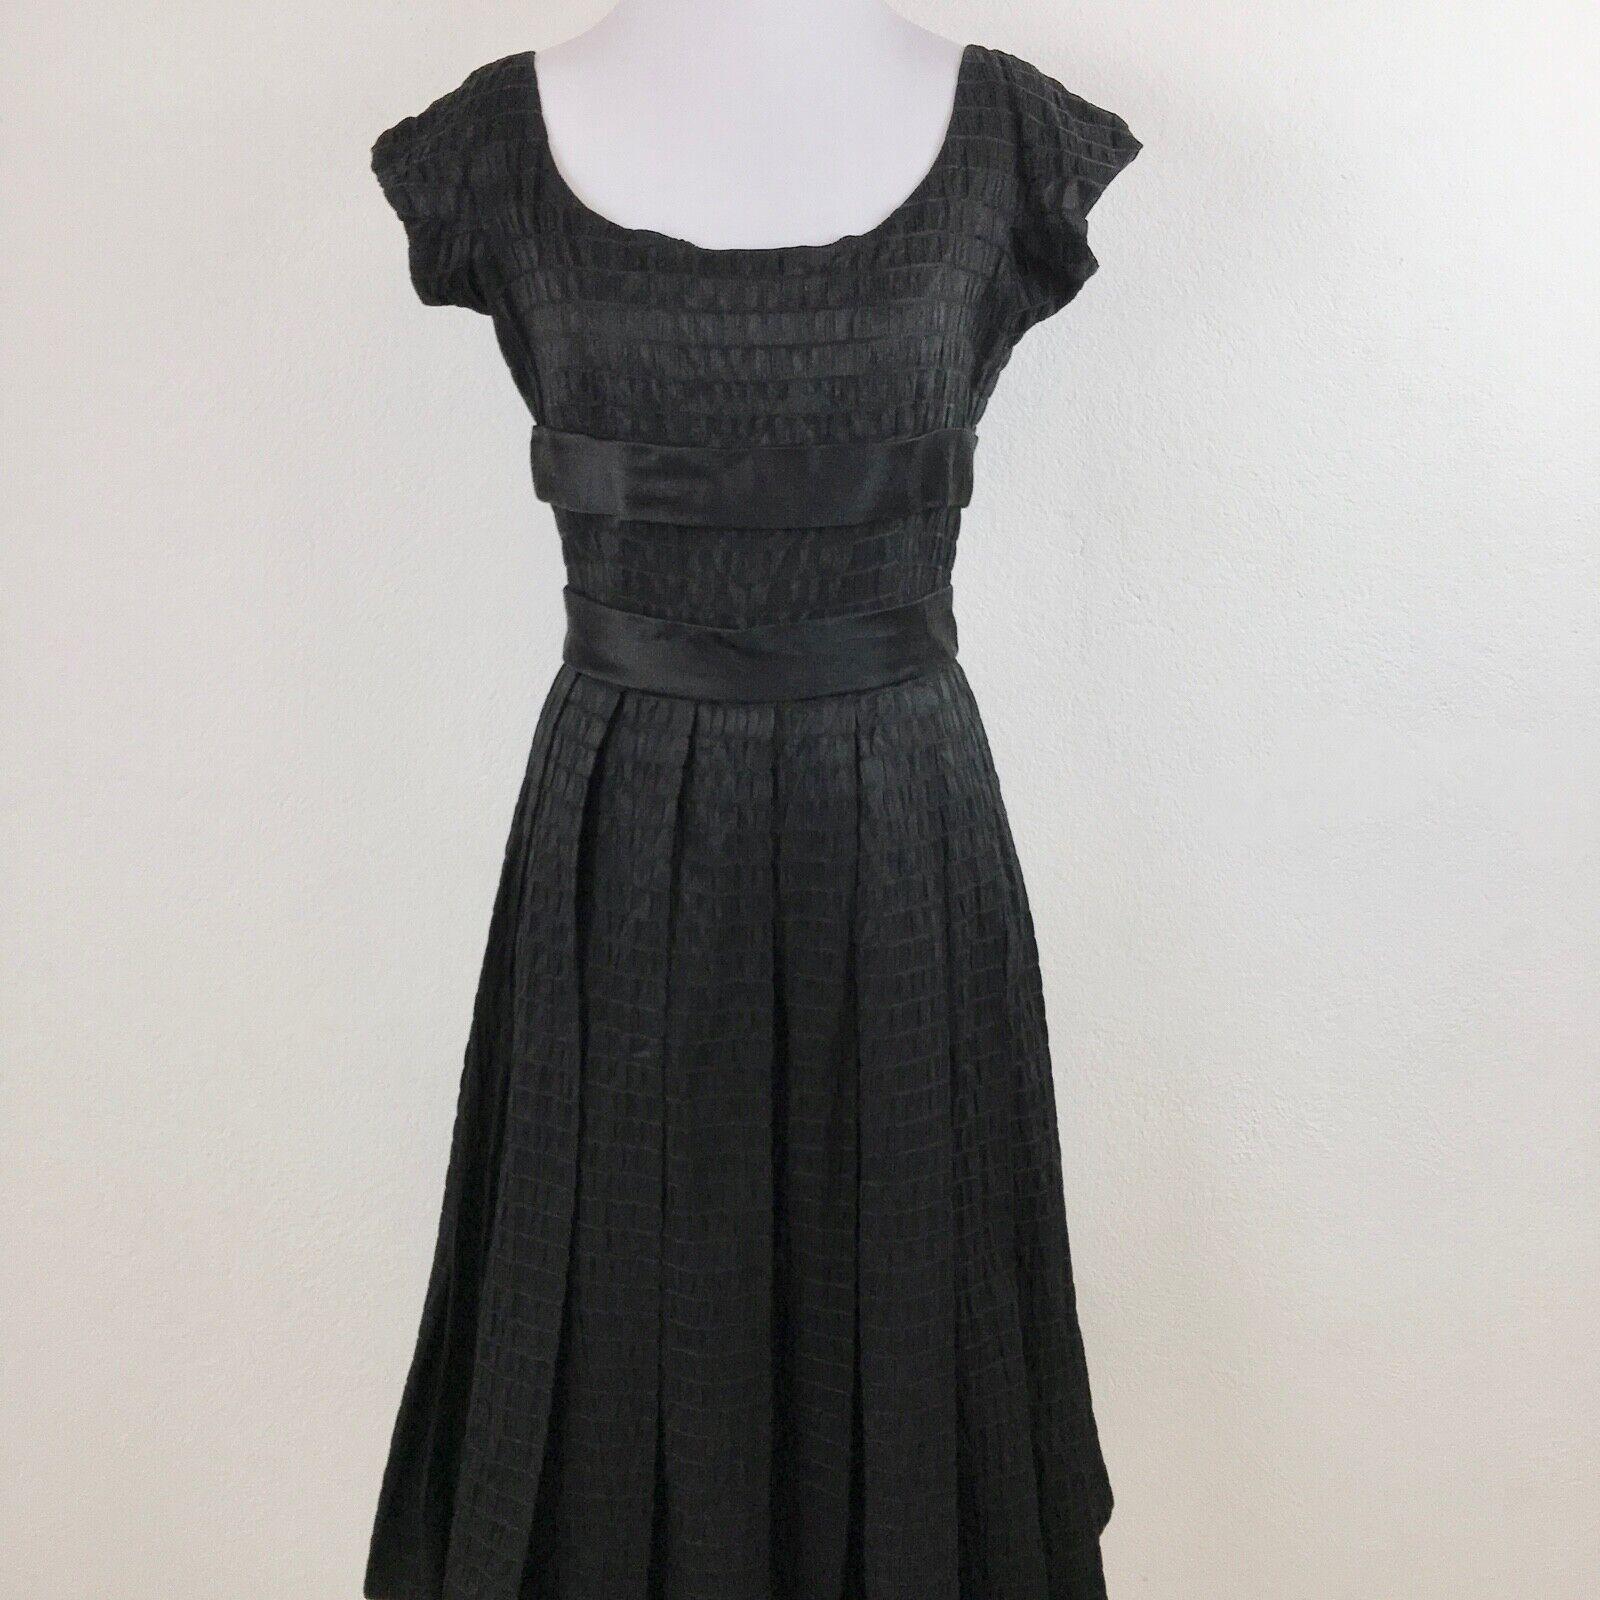 Barbara tfank Femme Fit Flare Midi robe noire taille 6 col bateau Soirée